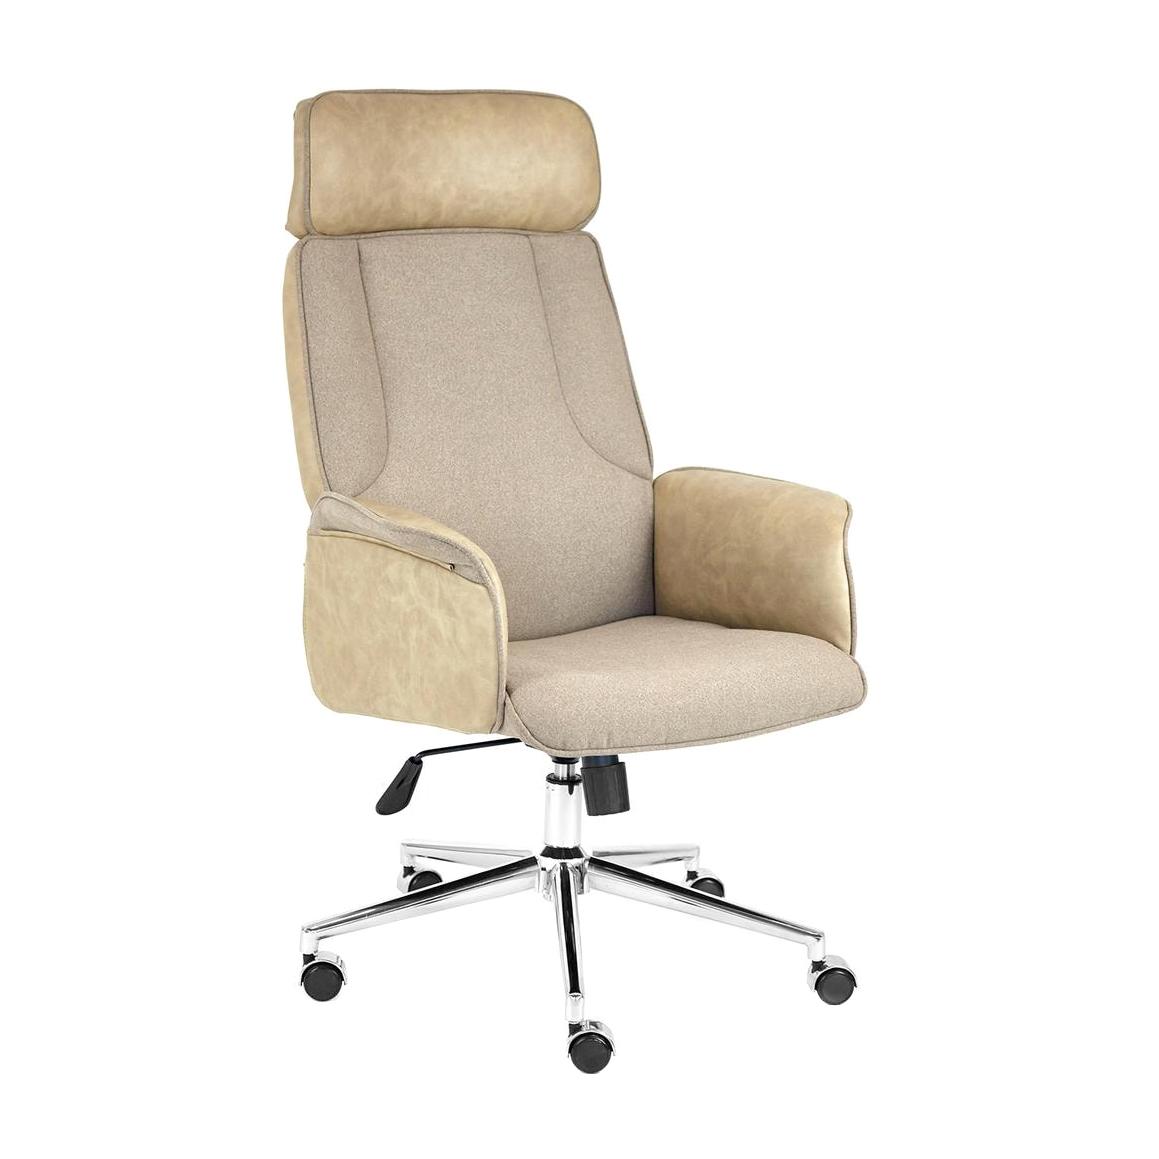 Кресло компьютерное TC коричневый/бежевый 128х45х47 см кресло tc натуральный бежевый 65х56х77 см